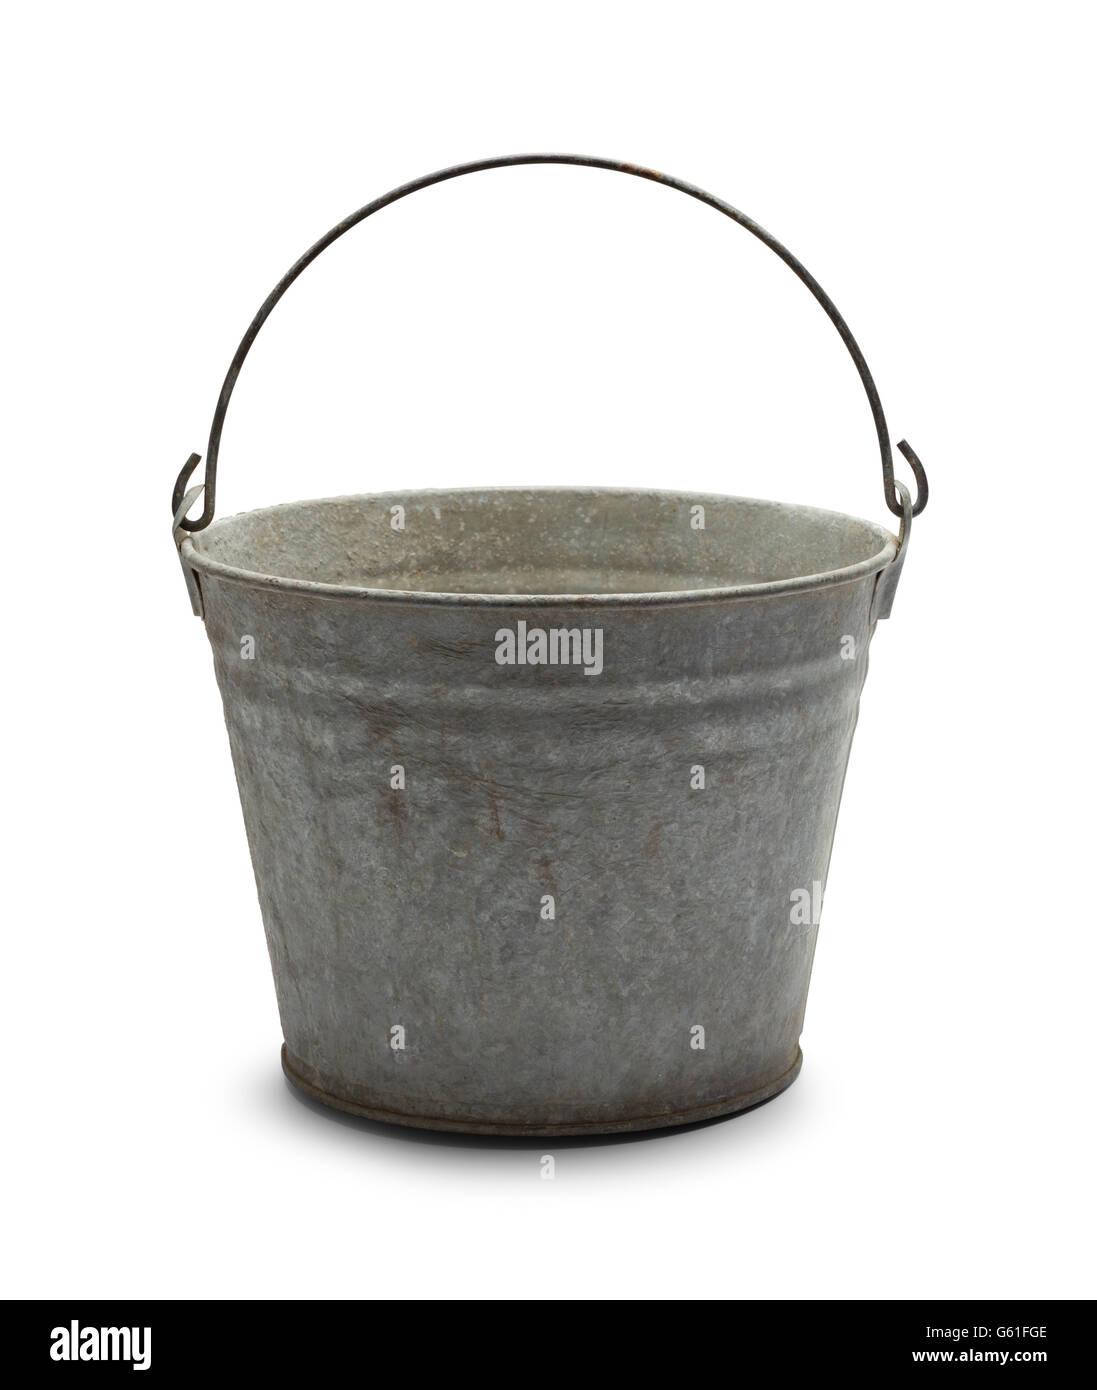 Empty Vintage Steel Bucket Isolated on White Background. - Stock Image